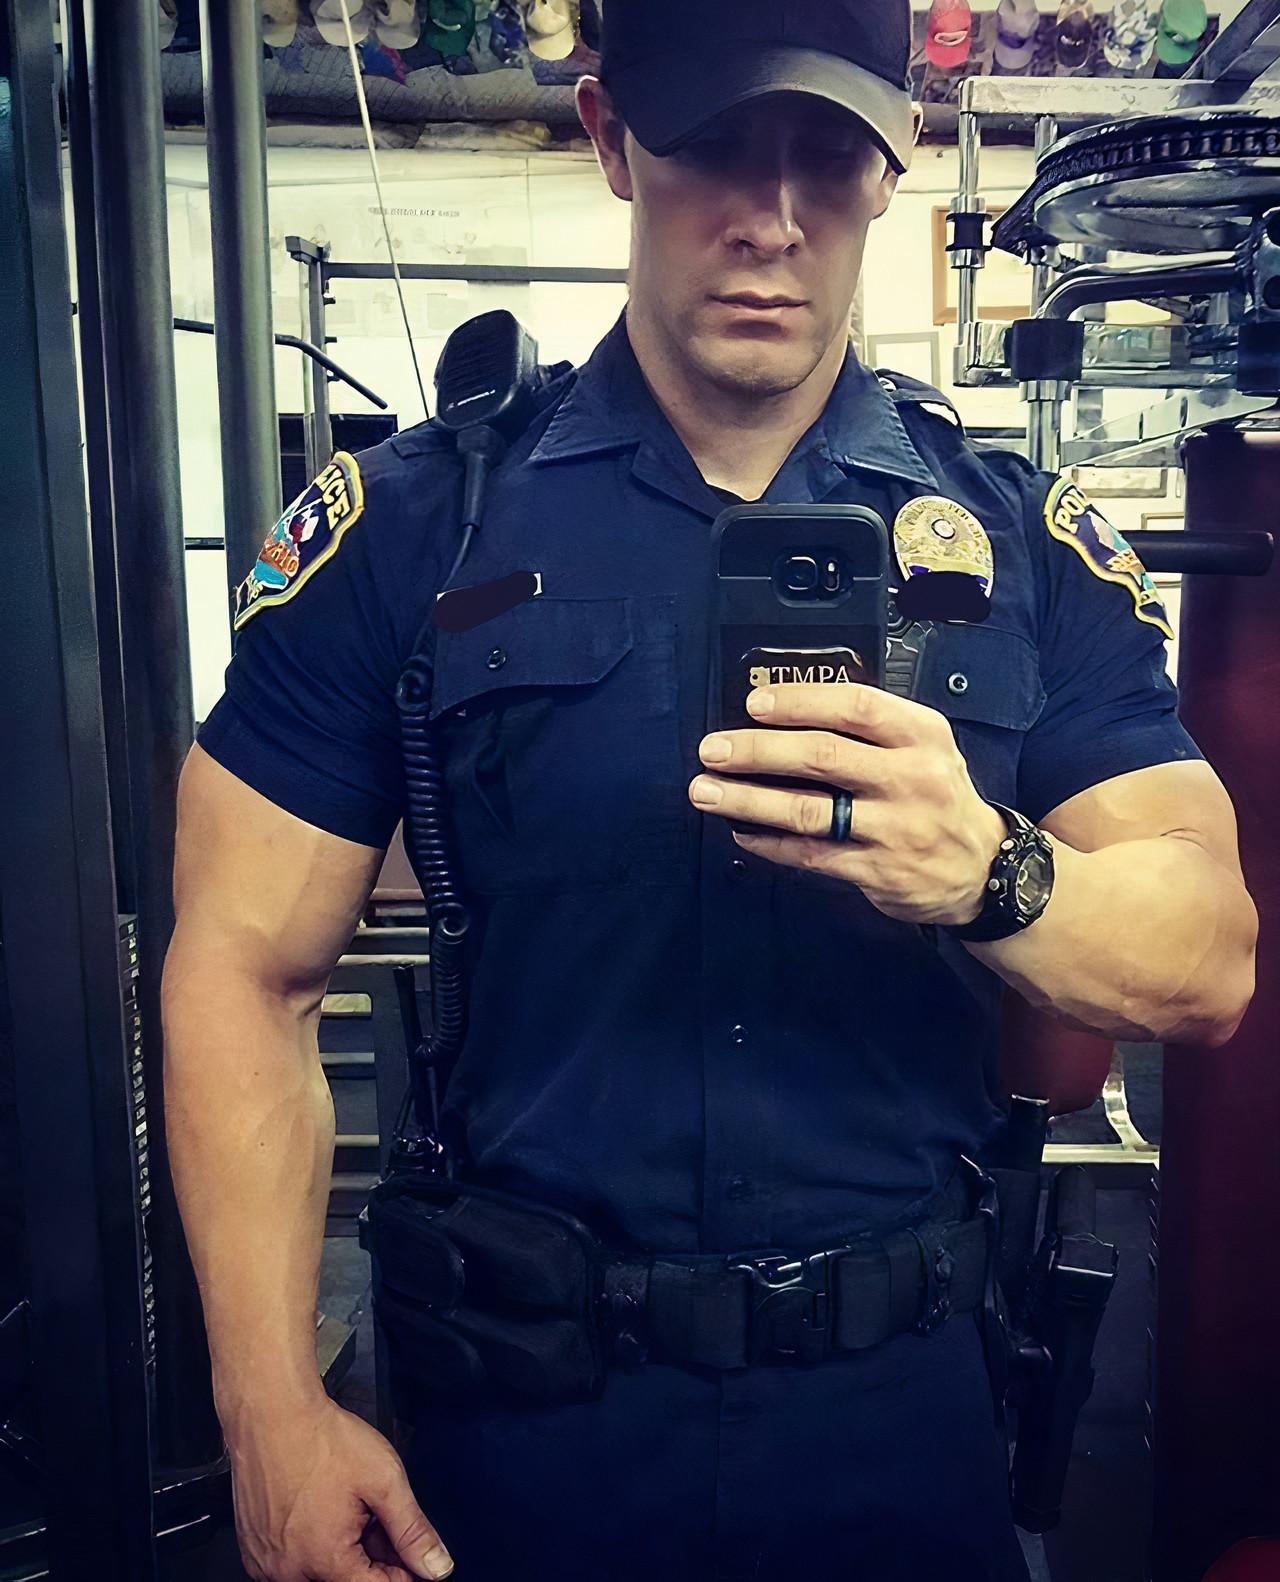 strong-muscular-straight-masculine-alpha-male-policeman-uniform-big-biceps-gym-selfie